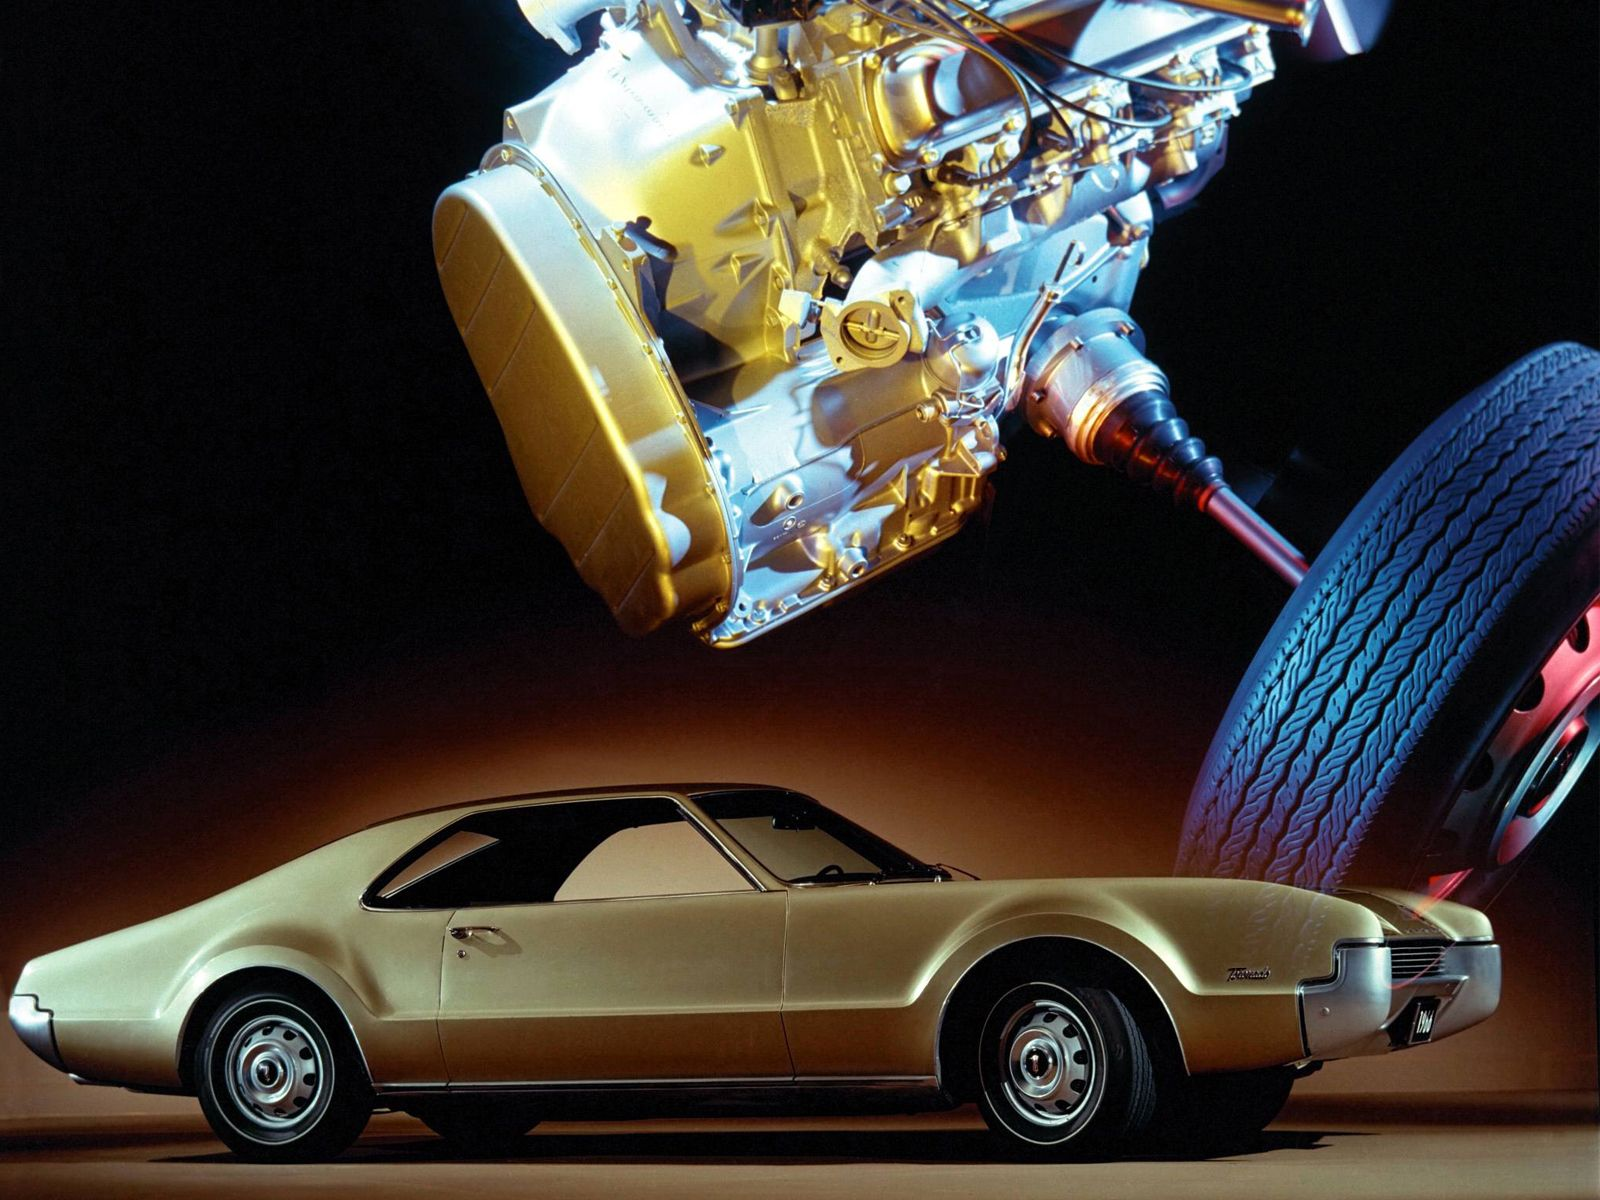 1966 oldsmobile toronado 9487 luxury classic fwd engine wheel g